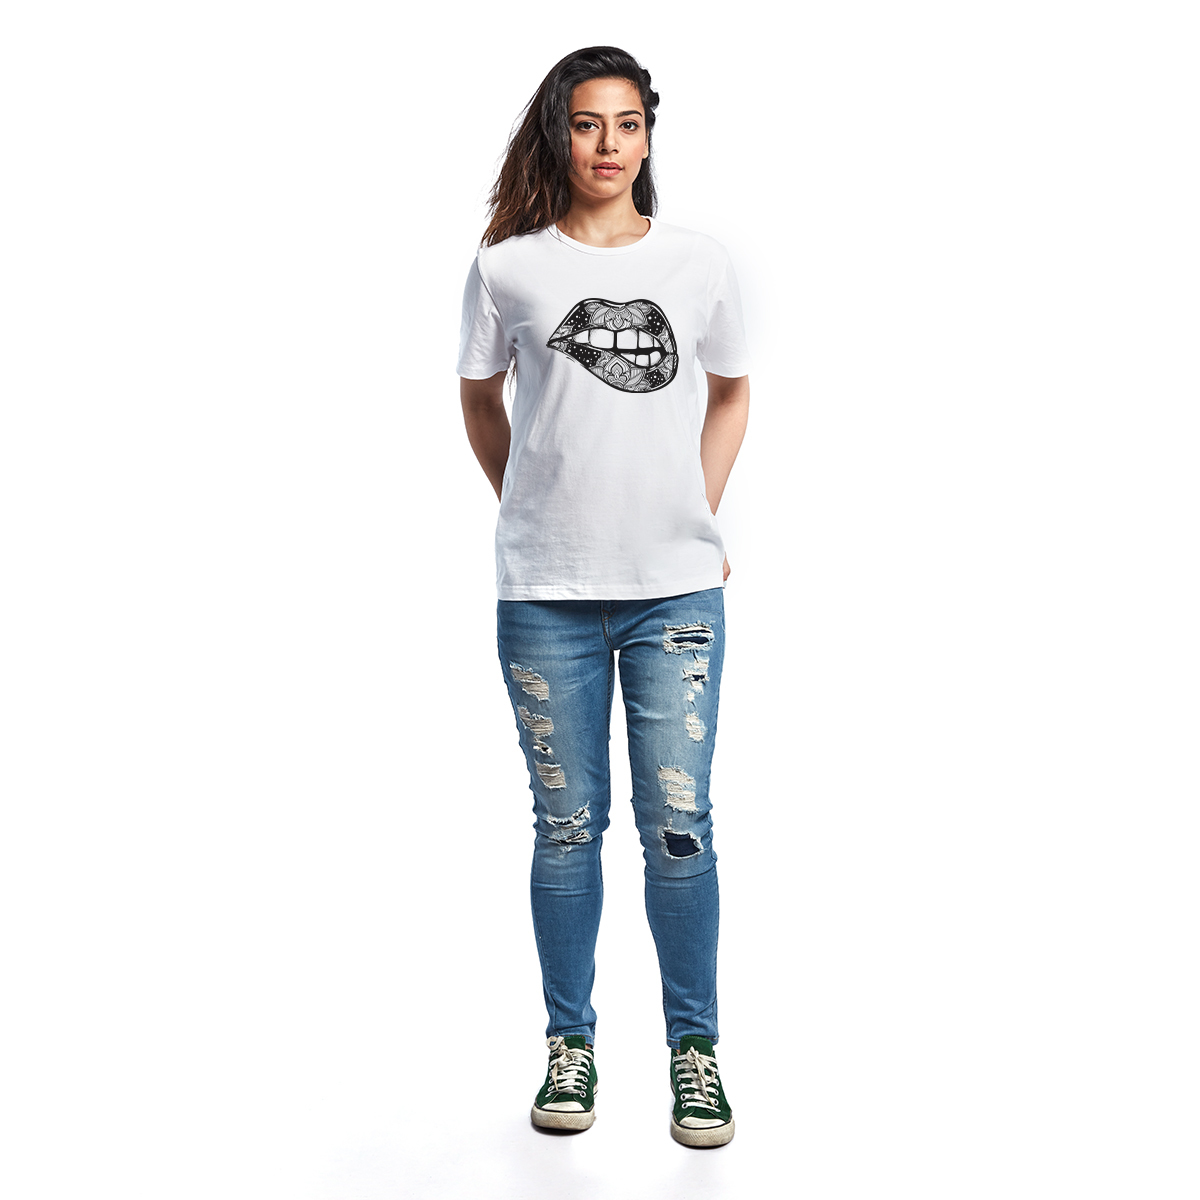 Artistic Lips Yedaz Women's Printed Trendy T-Shirt